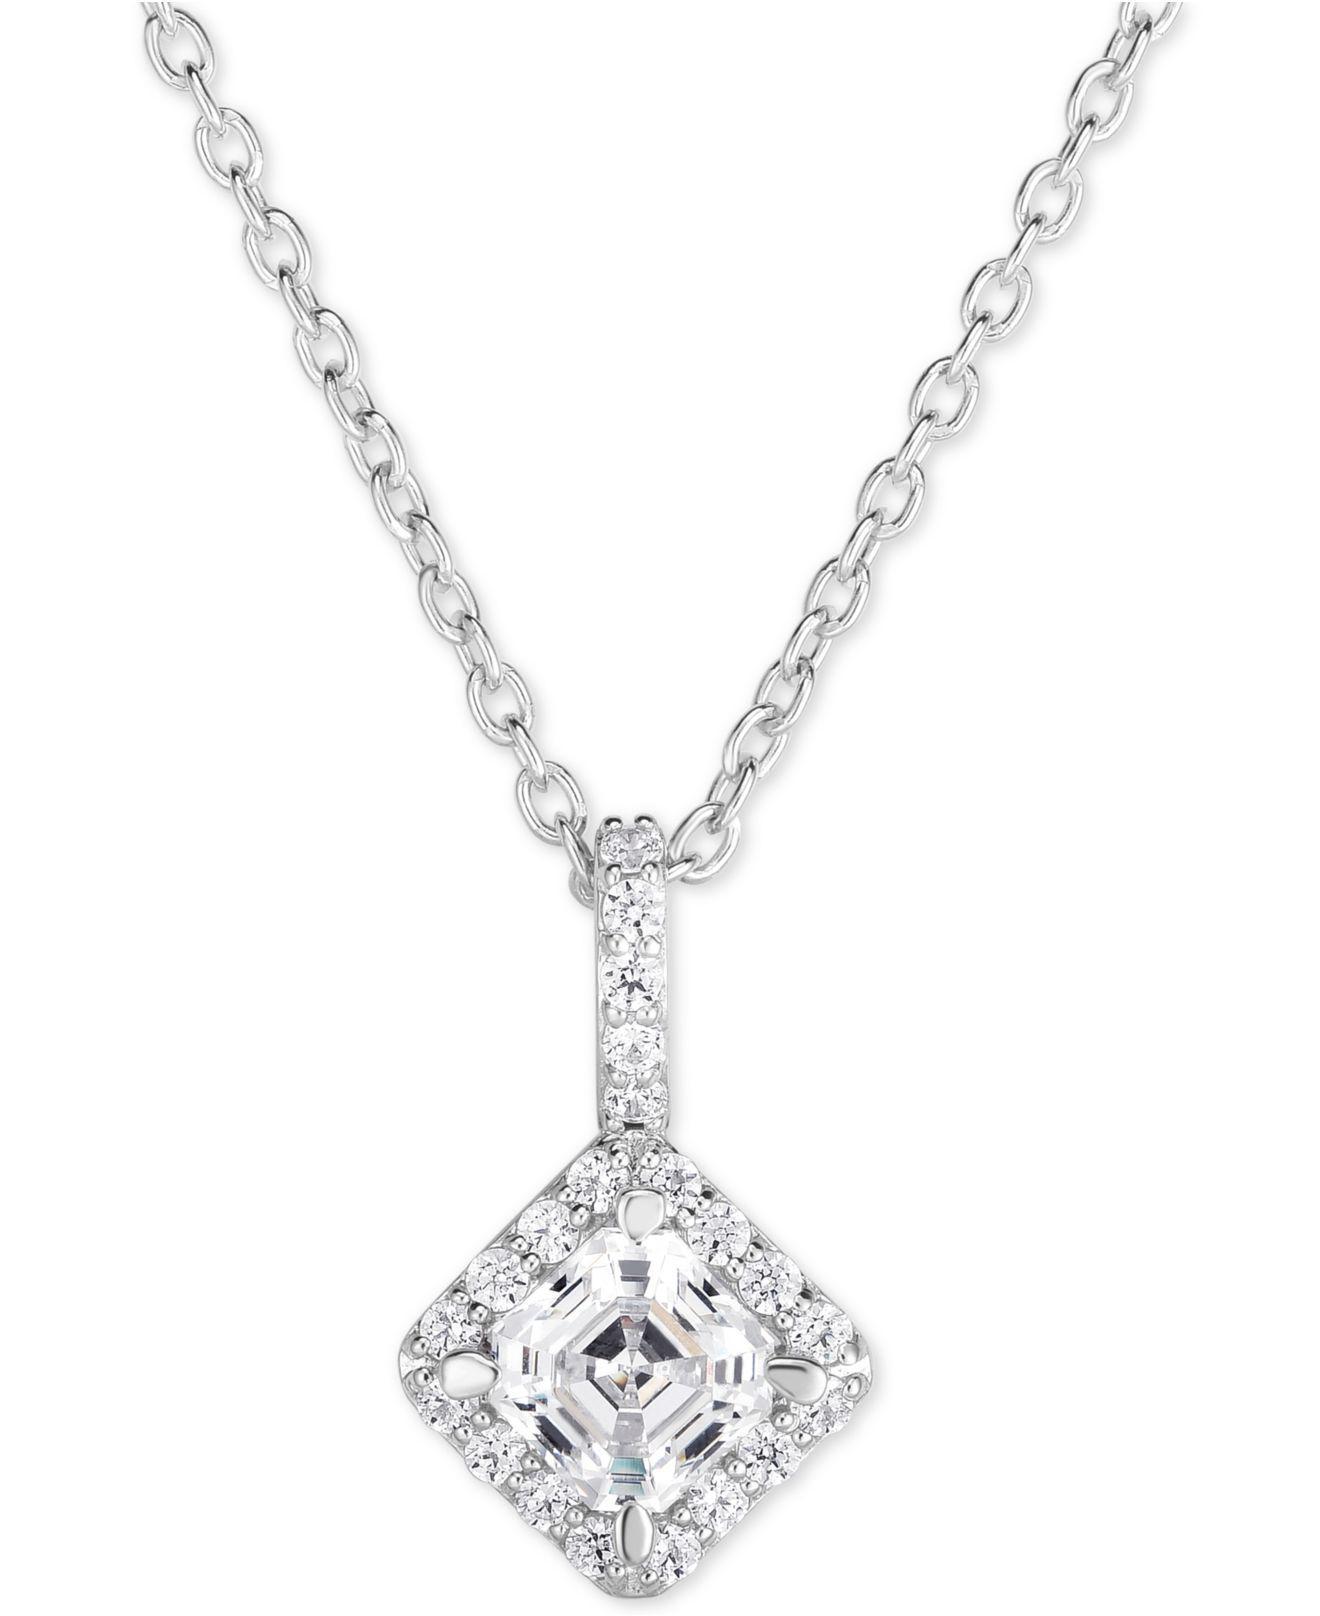 Arabella Rose Quartz Heart Pendant Necklace Silver Chain Q1uJ1v ...